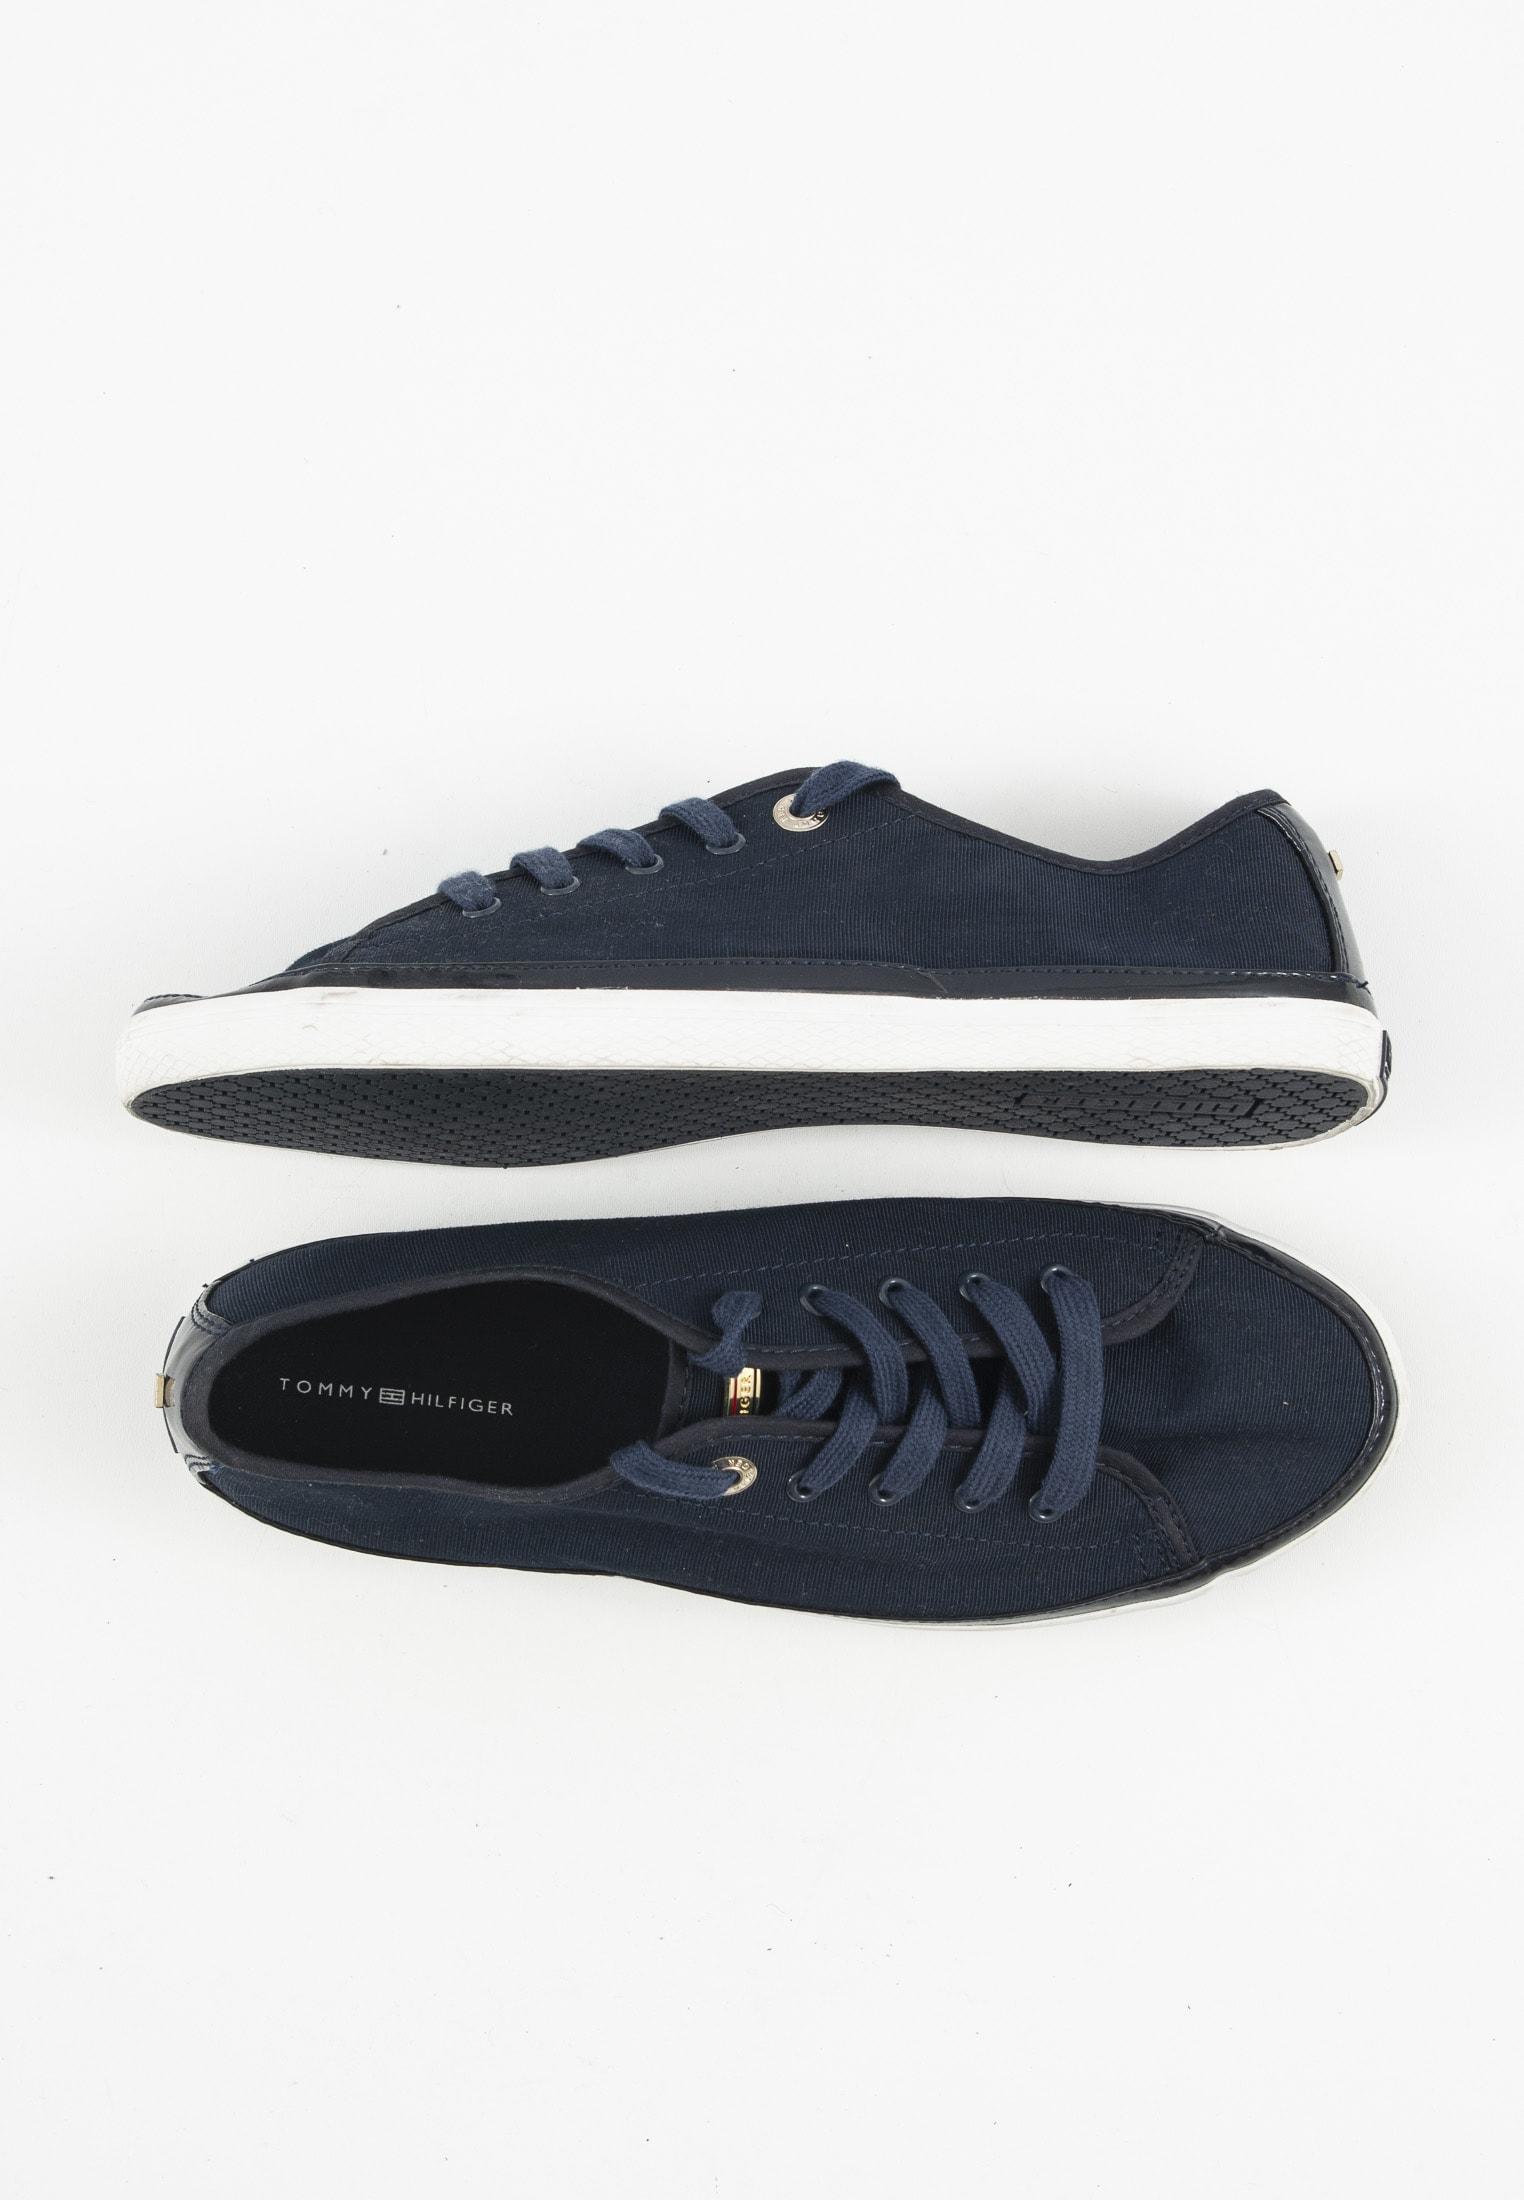 Tommy Hilfiger Sneakers Blau Gr.41